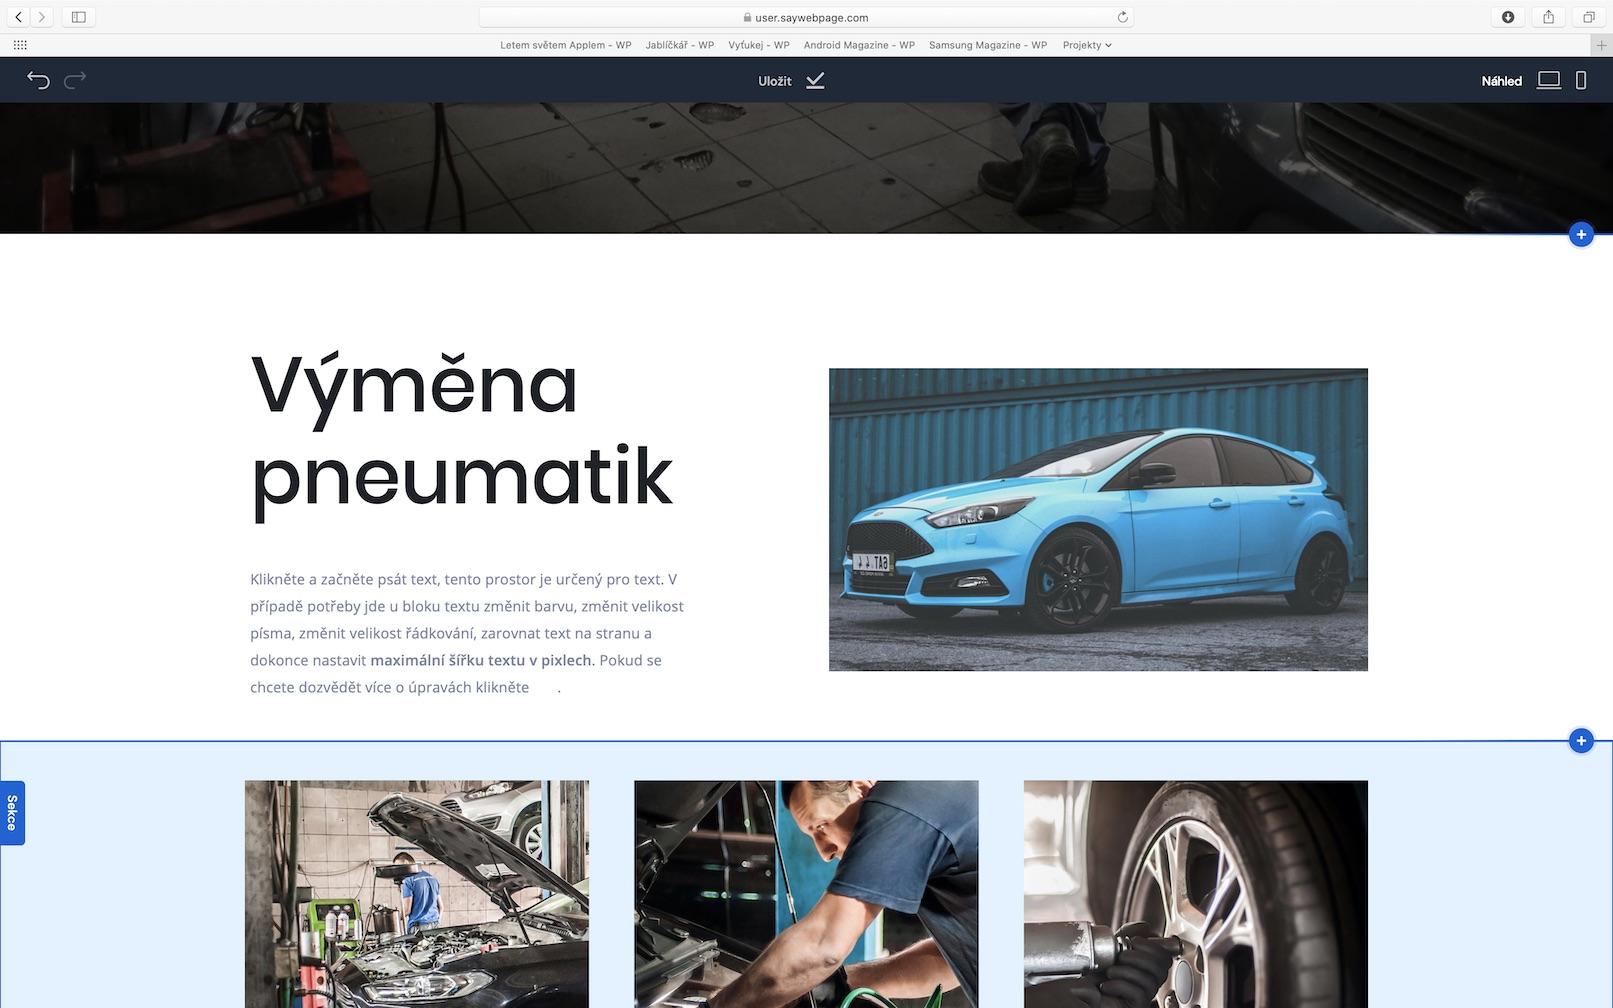 saywebpage